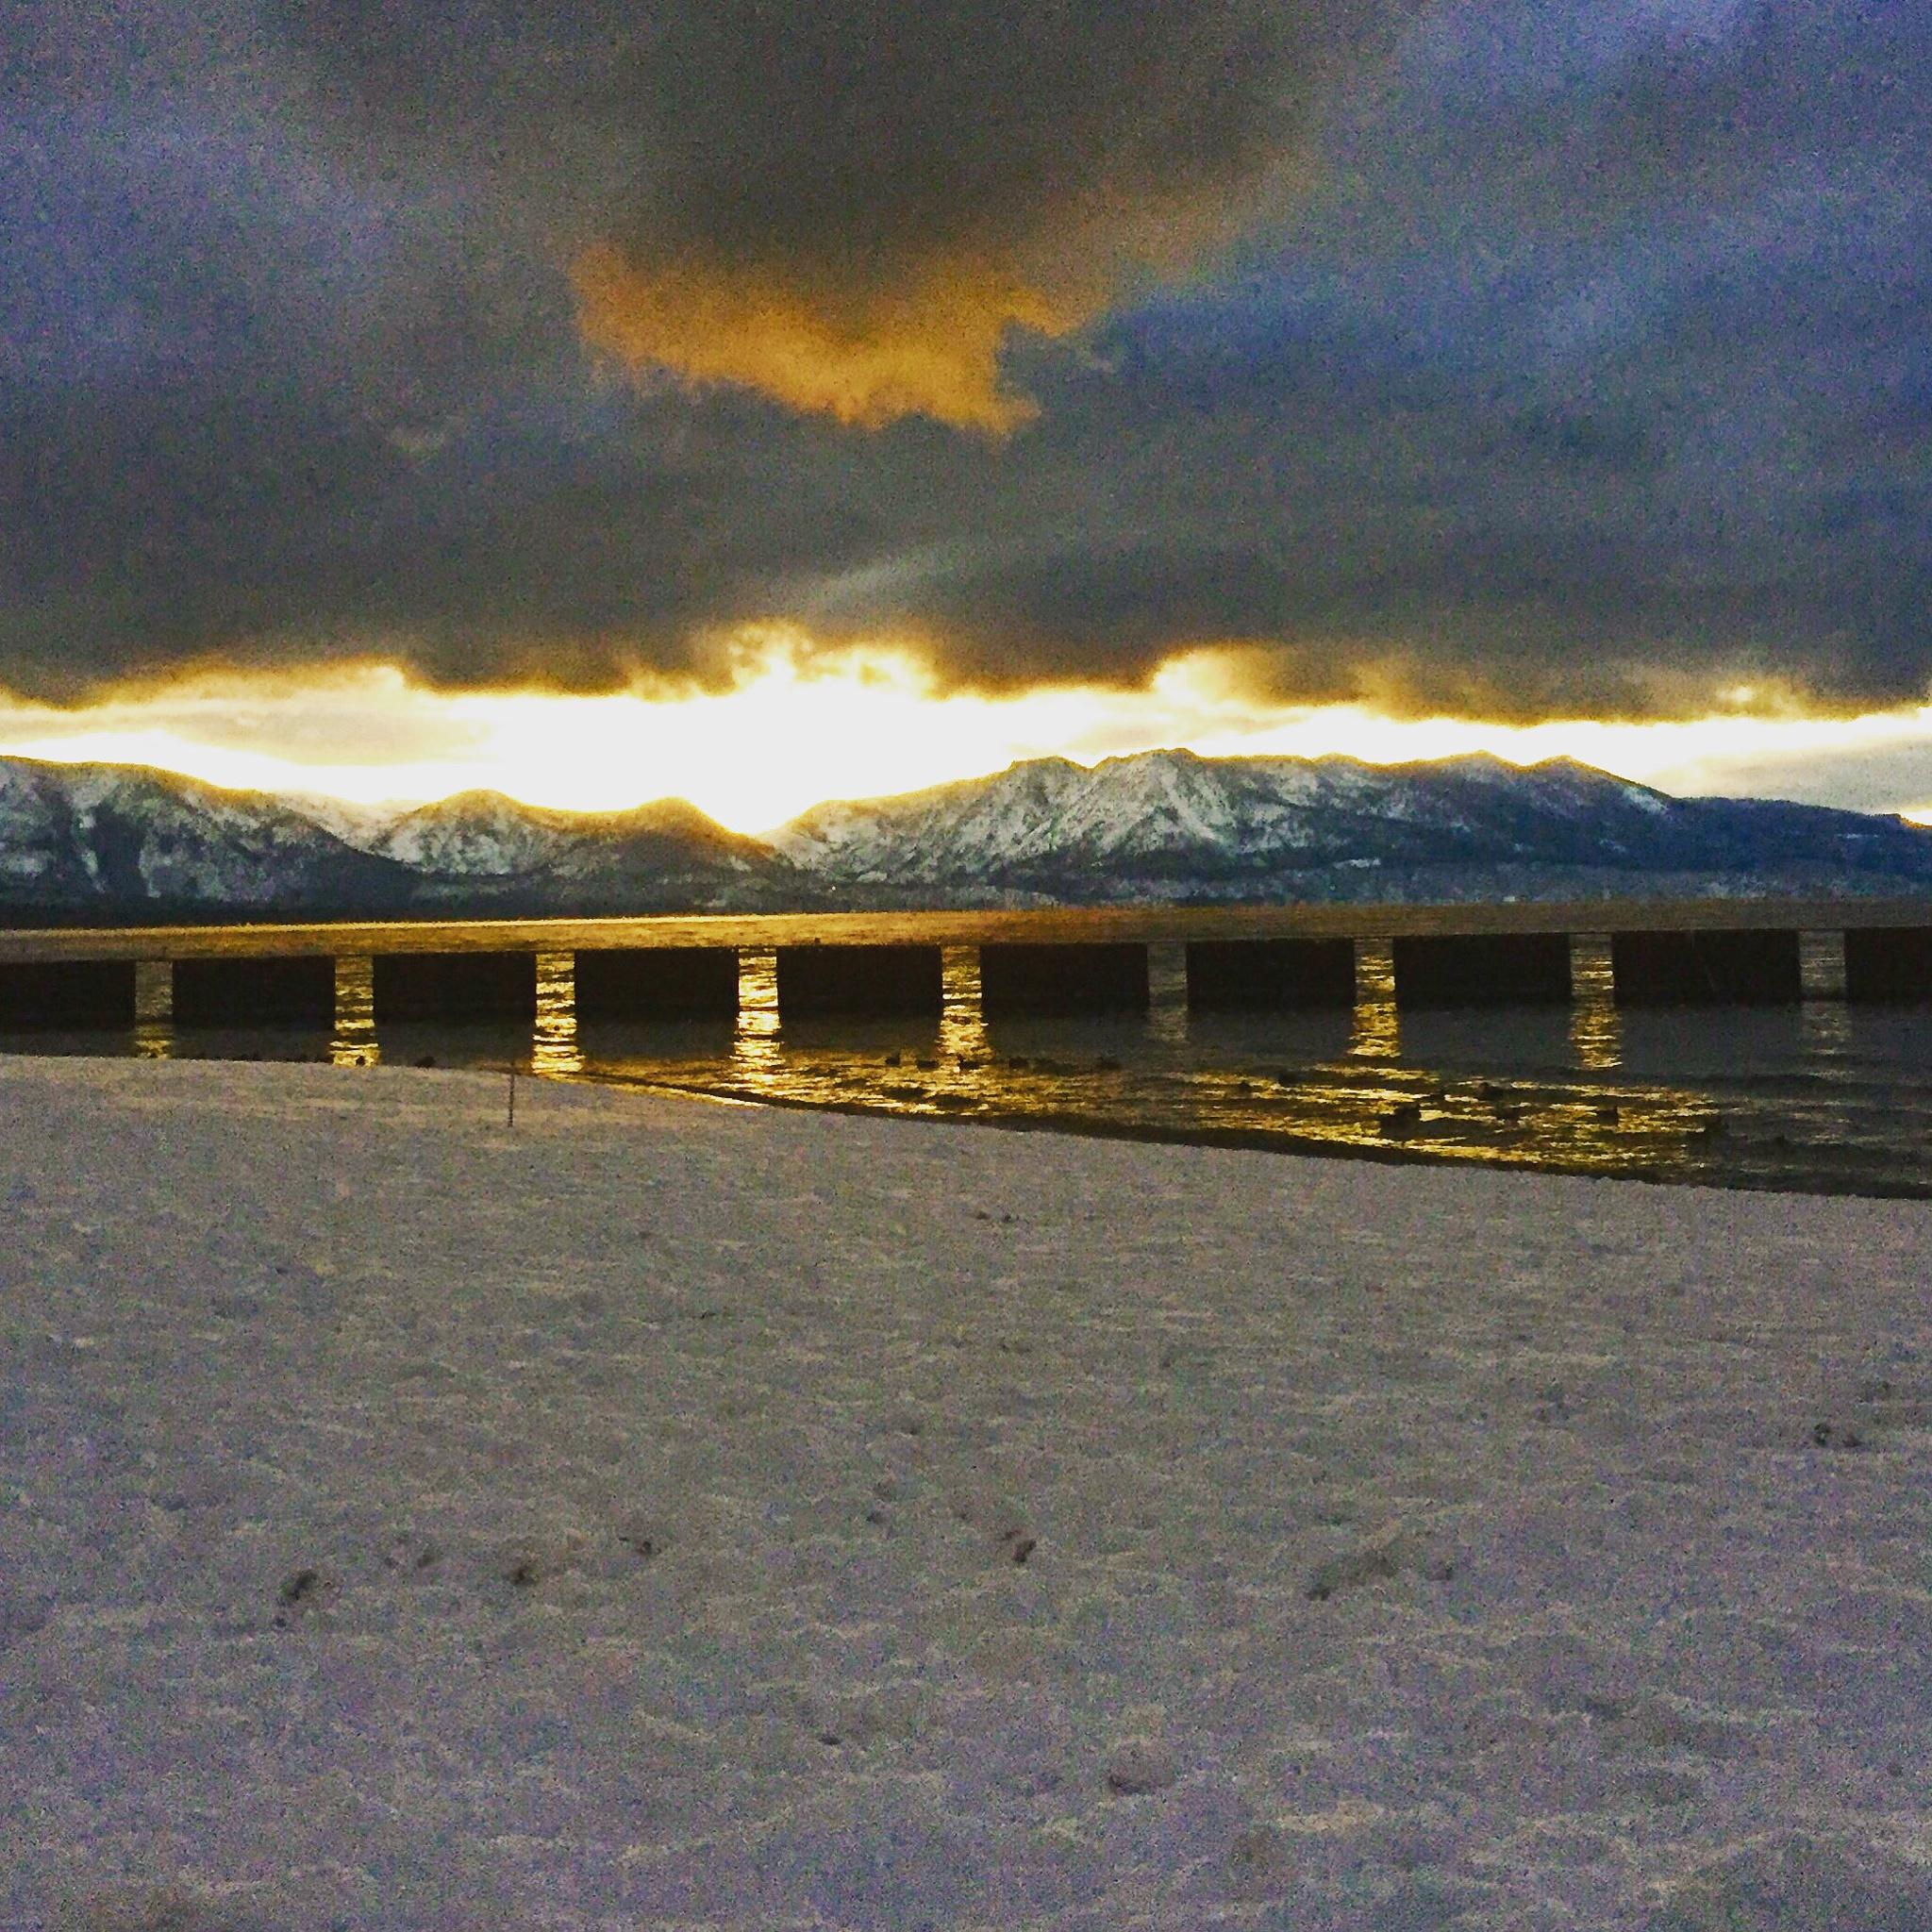 Night shoot of Lake Tahoe  by Best4u Photography